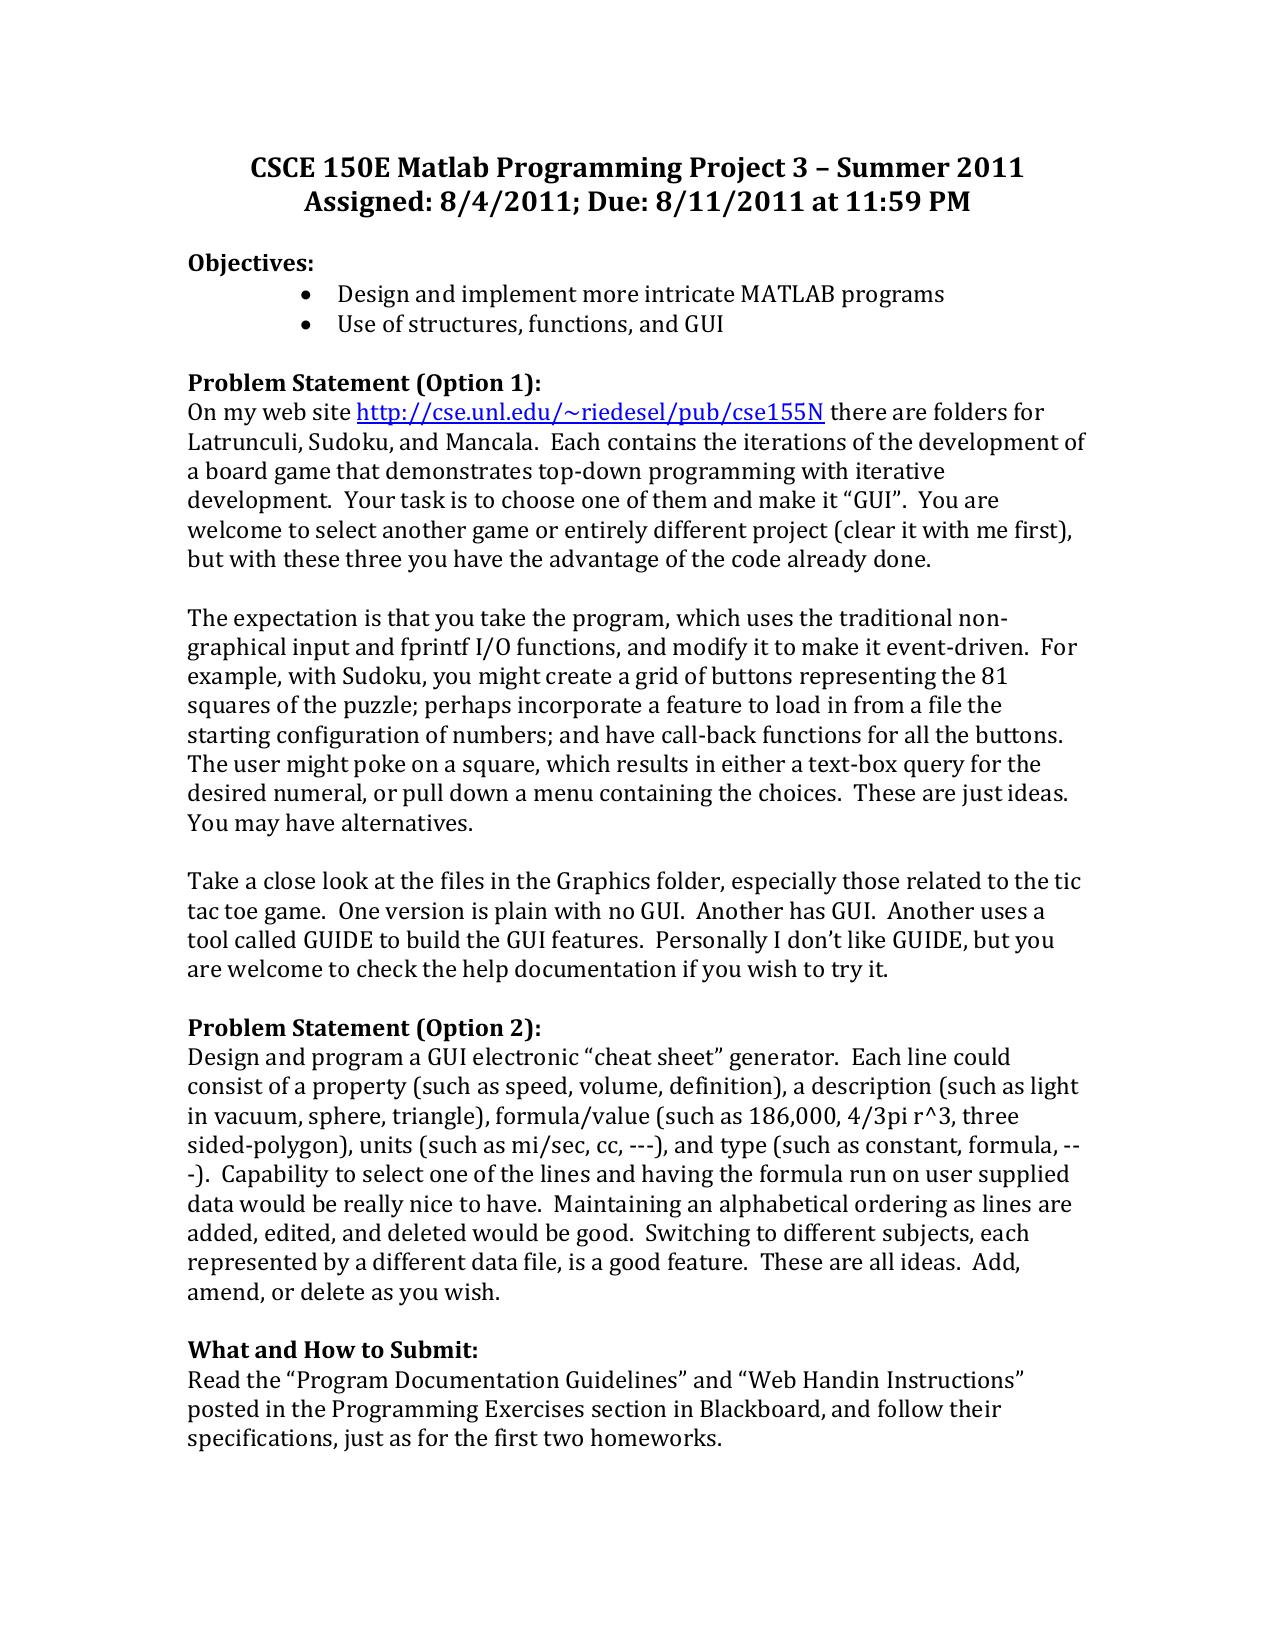 CSCE 150E Matlab Programming Project 3 – Summer 2011